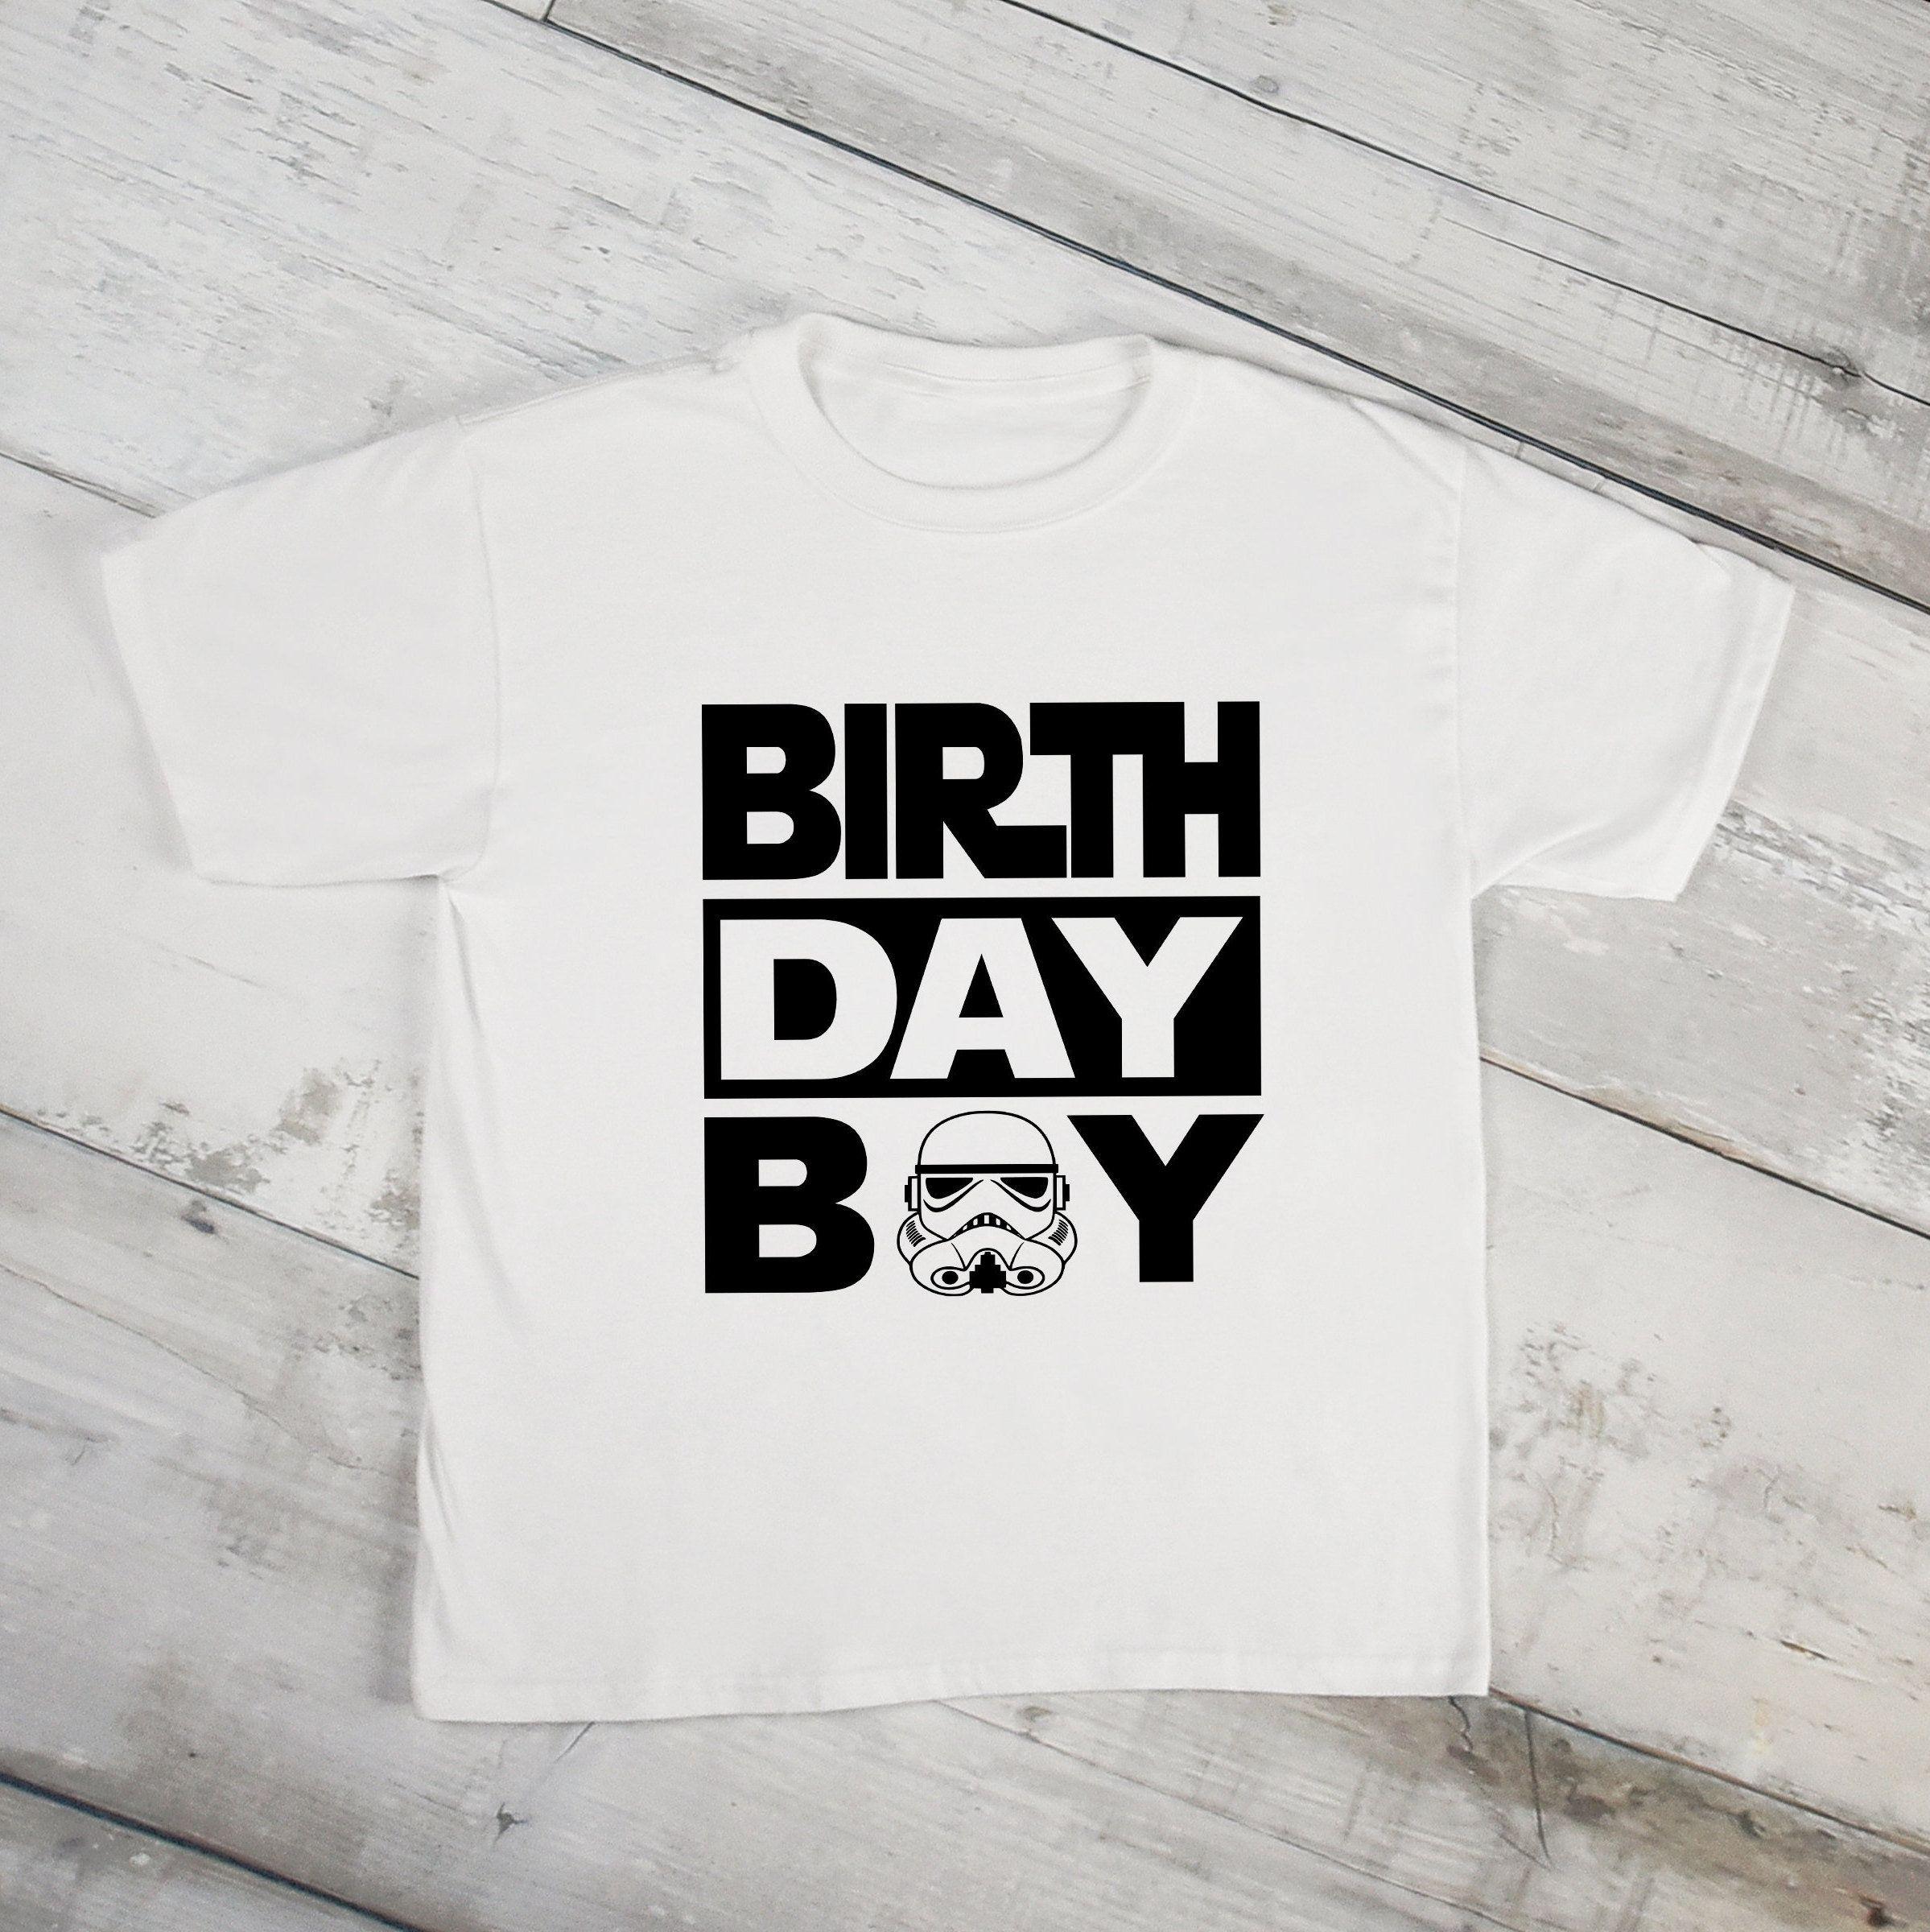 Stormtrooper Vader Birthday Boy Shirt Disney Family Shirts Star Wars Boys By